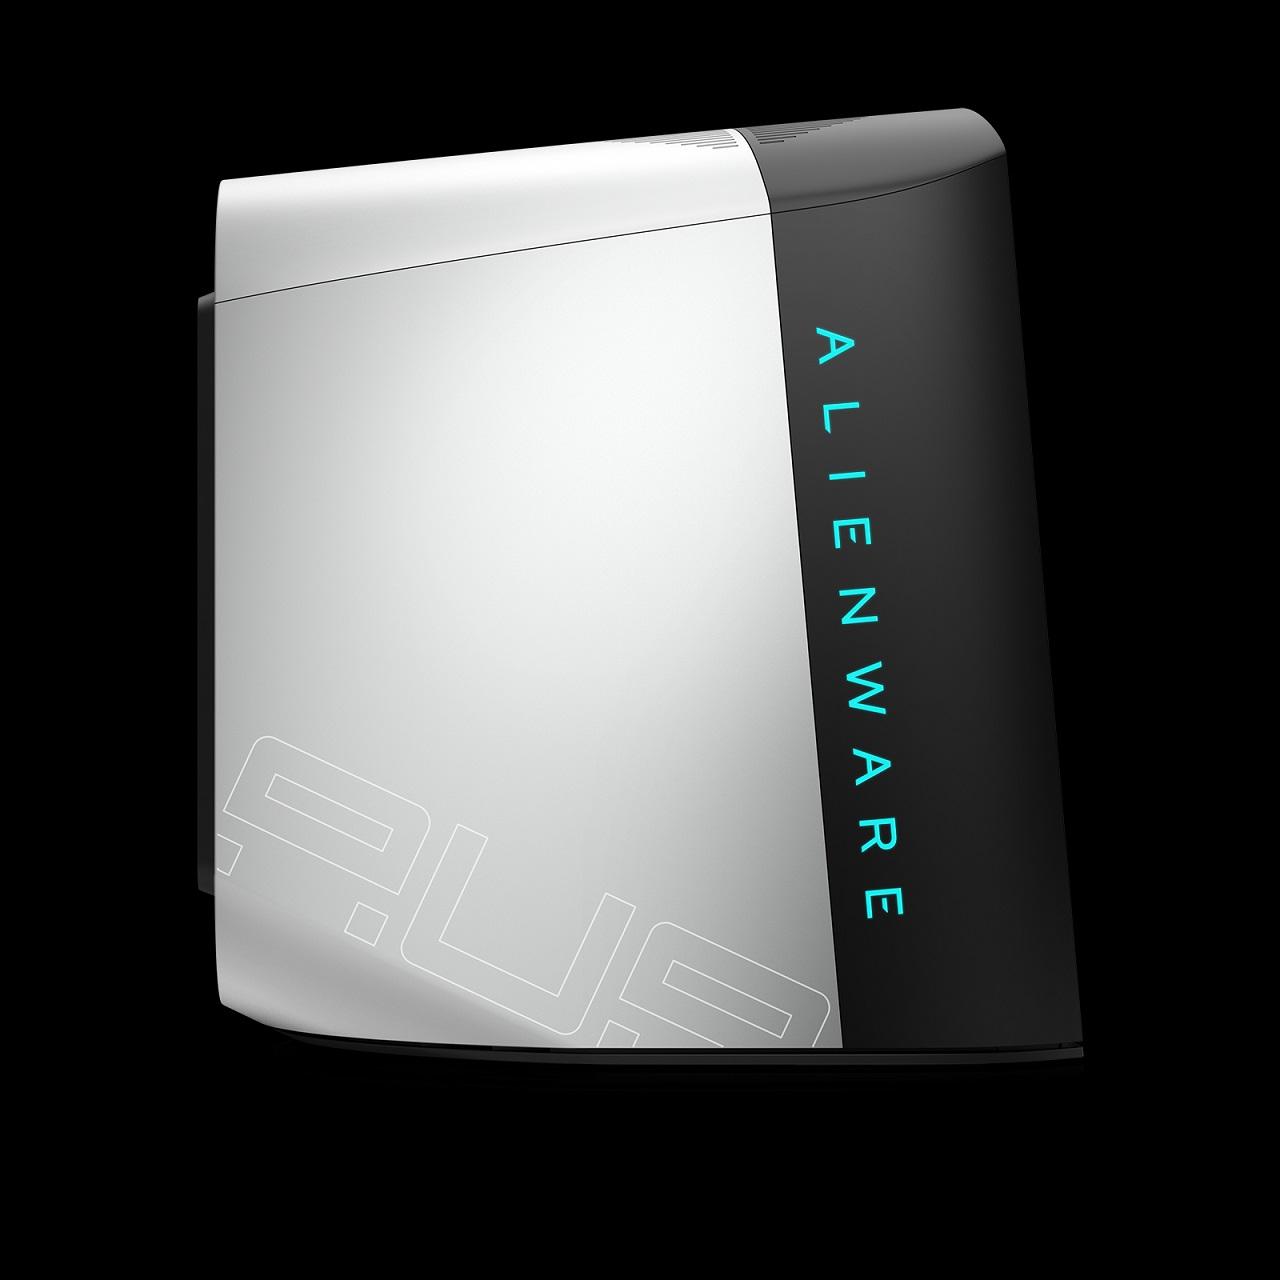 Dell has unveiled the Alienware Aurora R9 desktop at Gamescom 2019 12